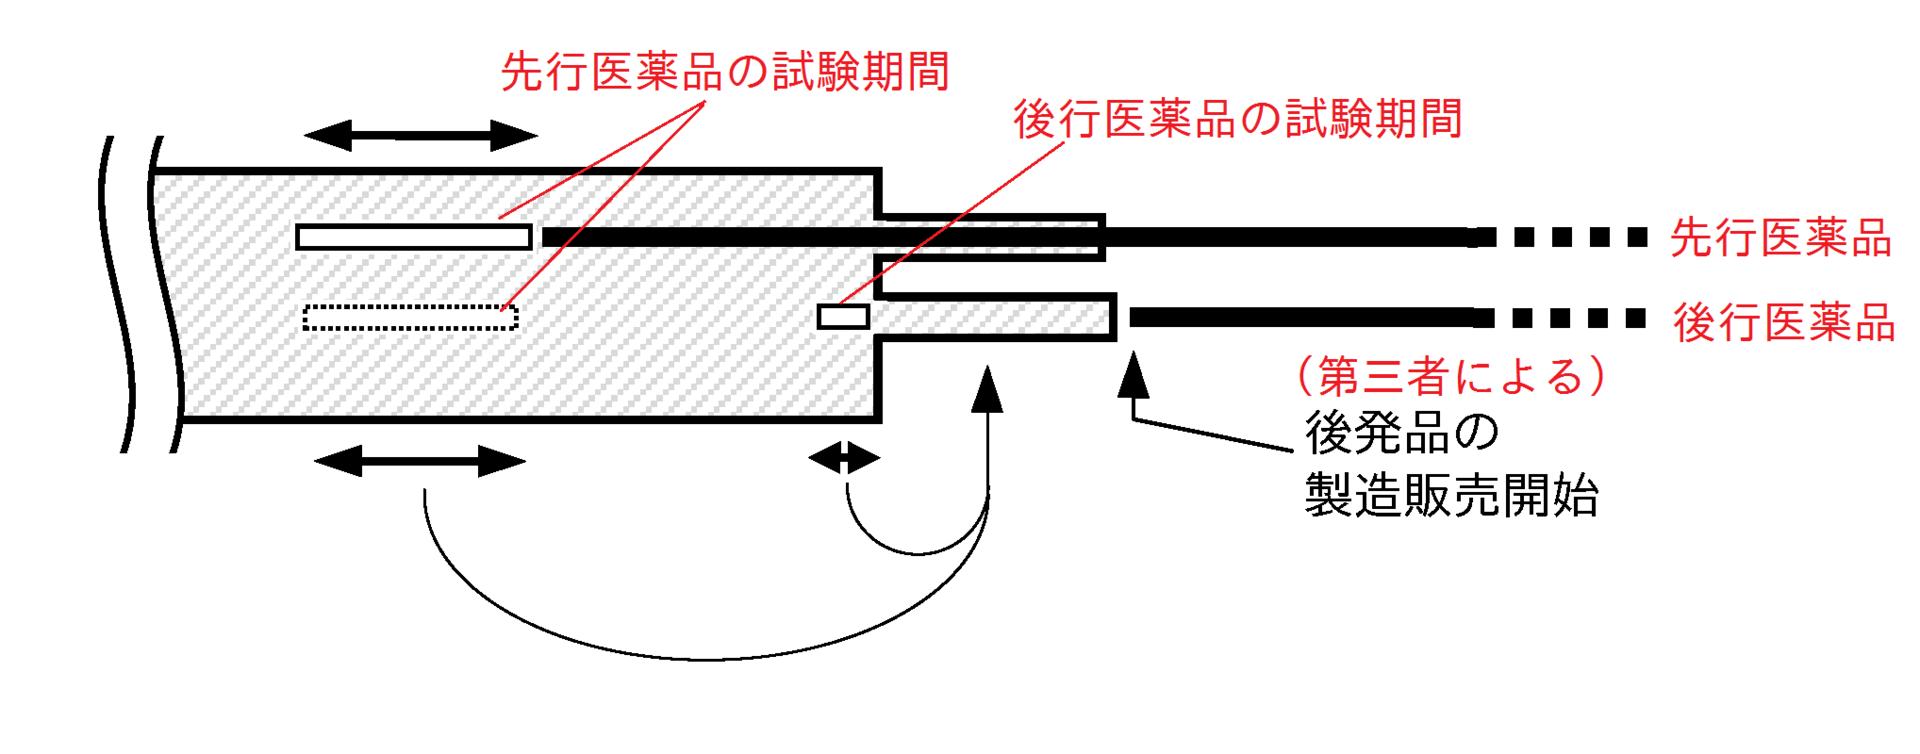 Sotoku01_p19r2.png